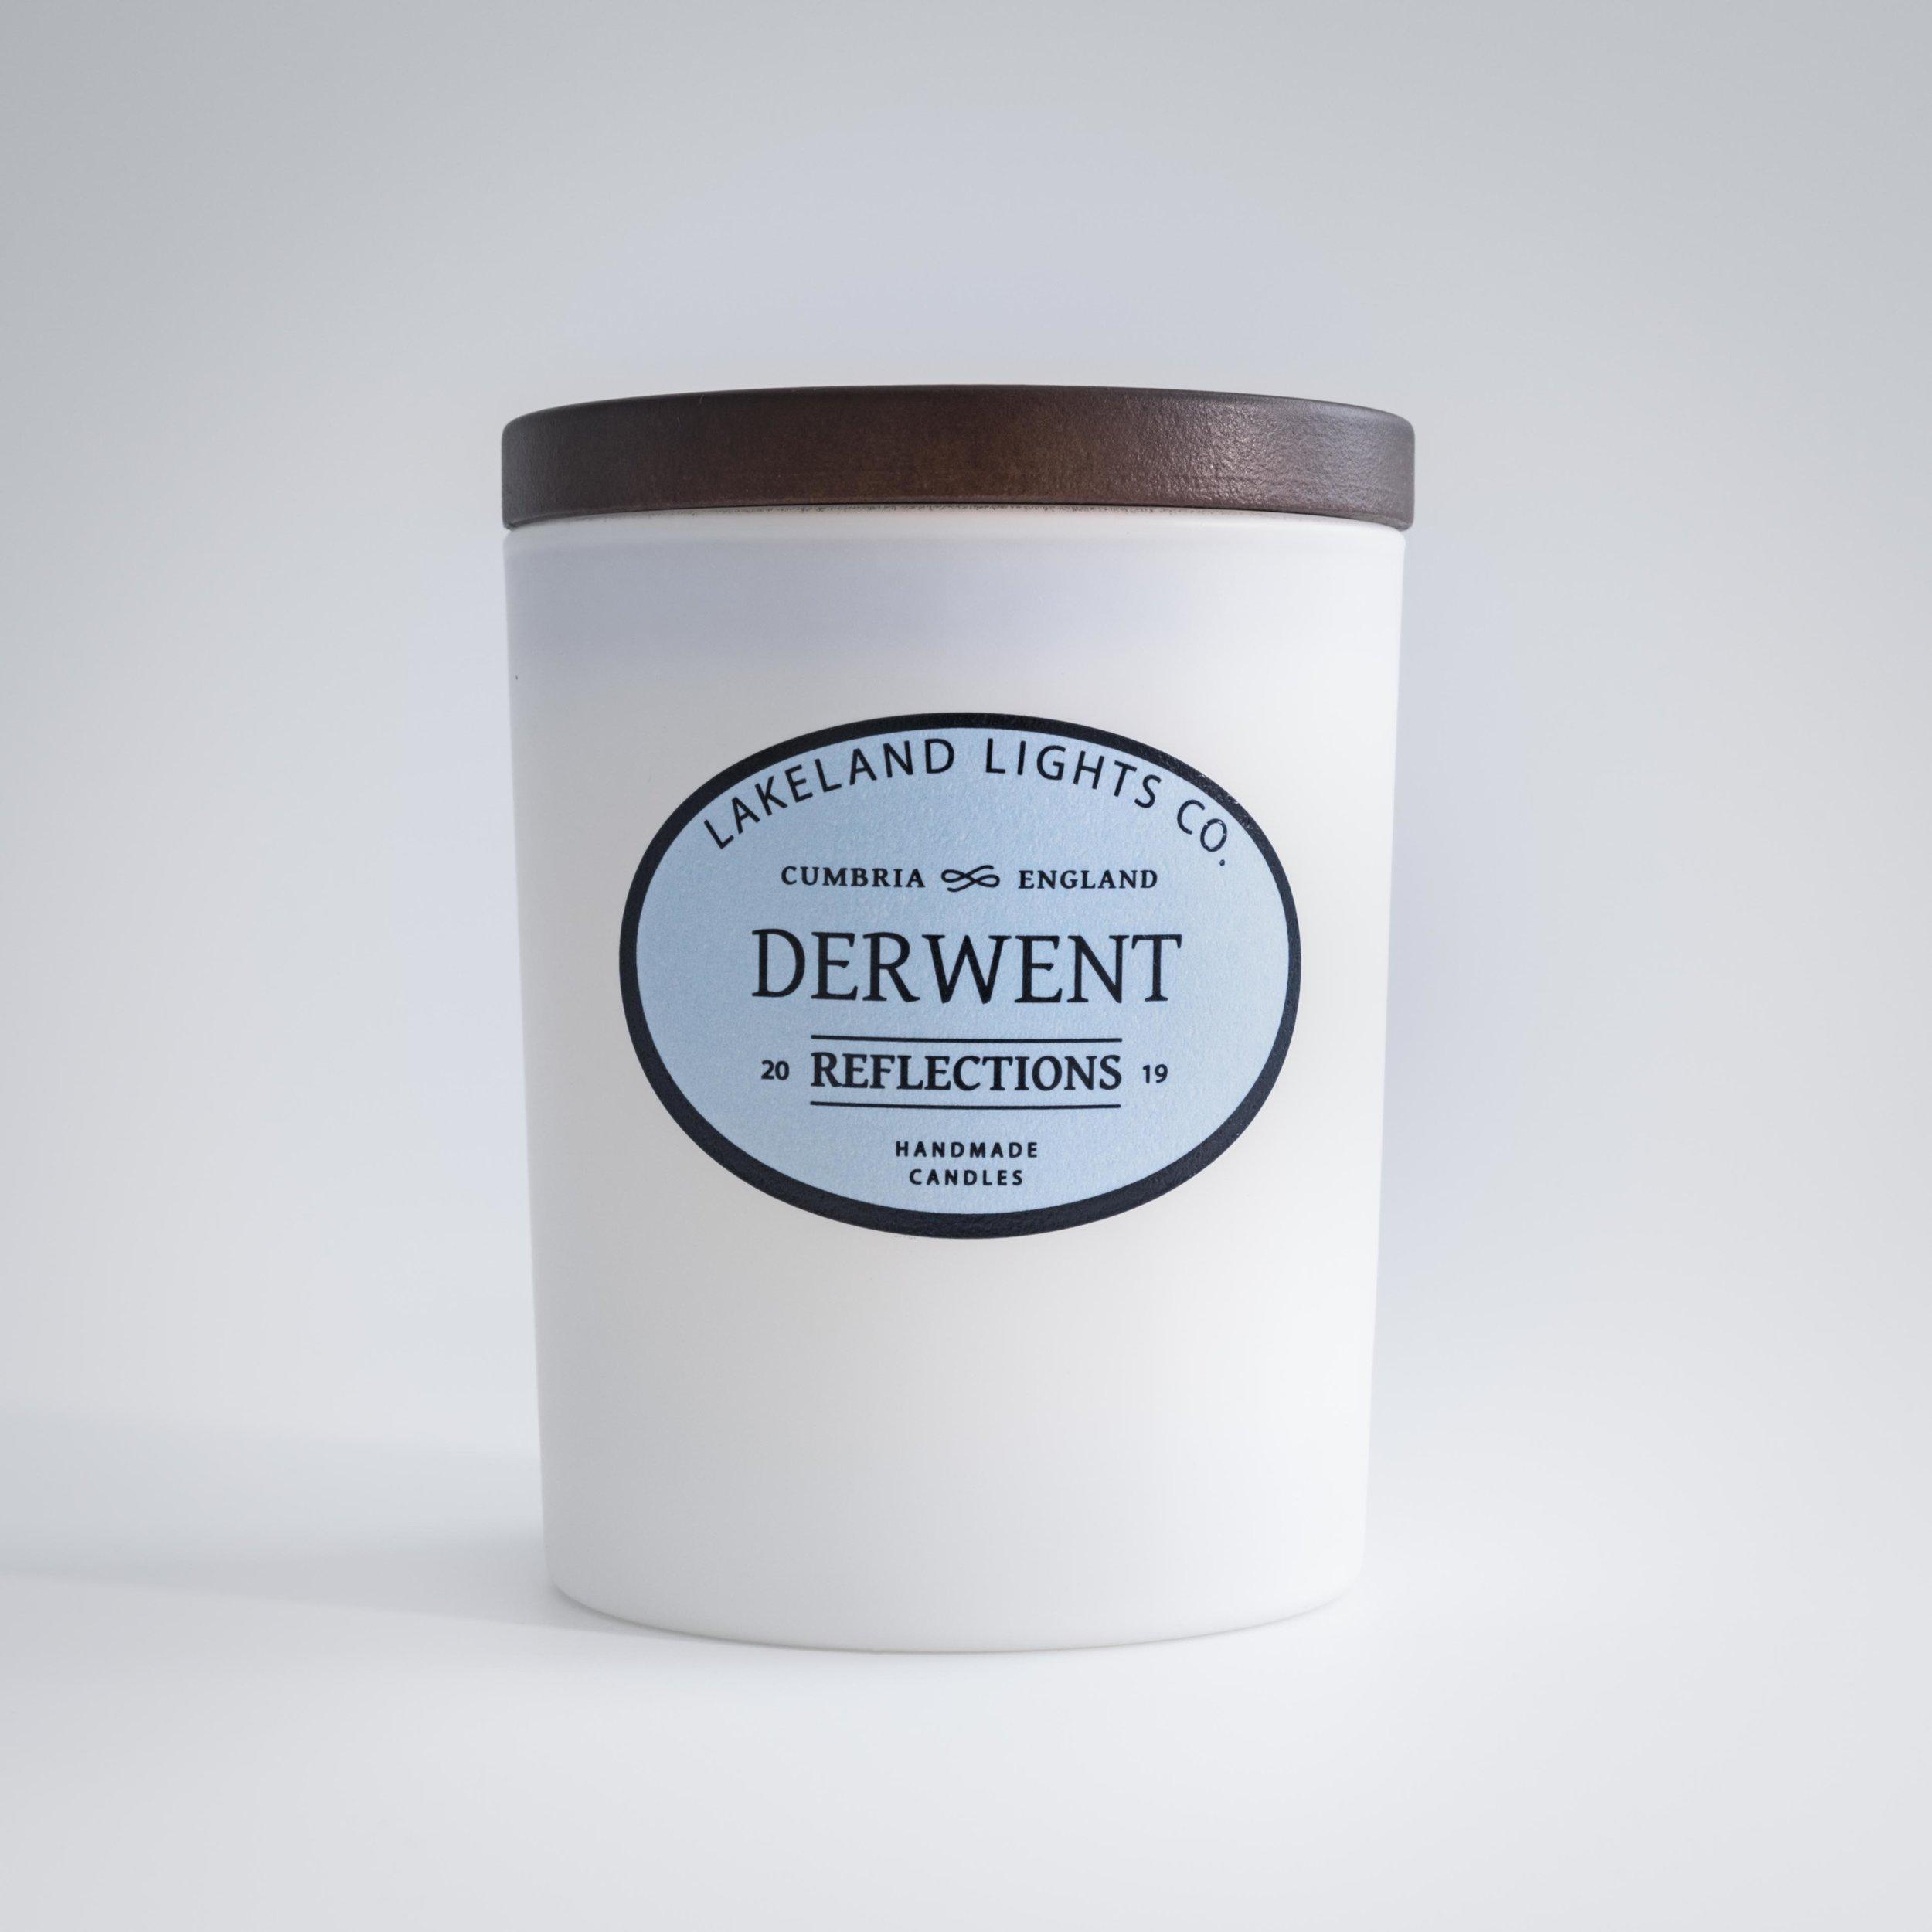 Derwent_Front_Lakeland_Lights_Company.jpg